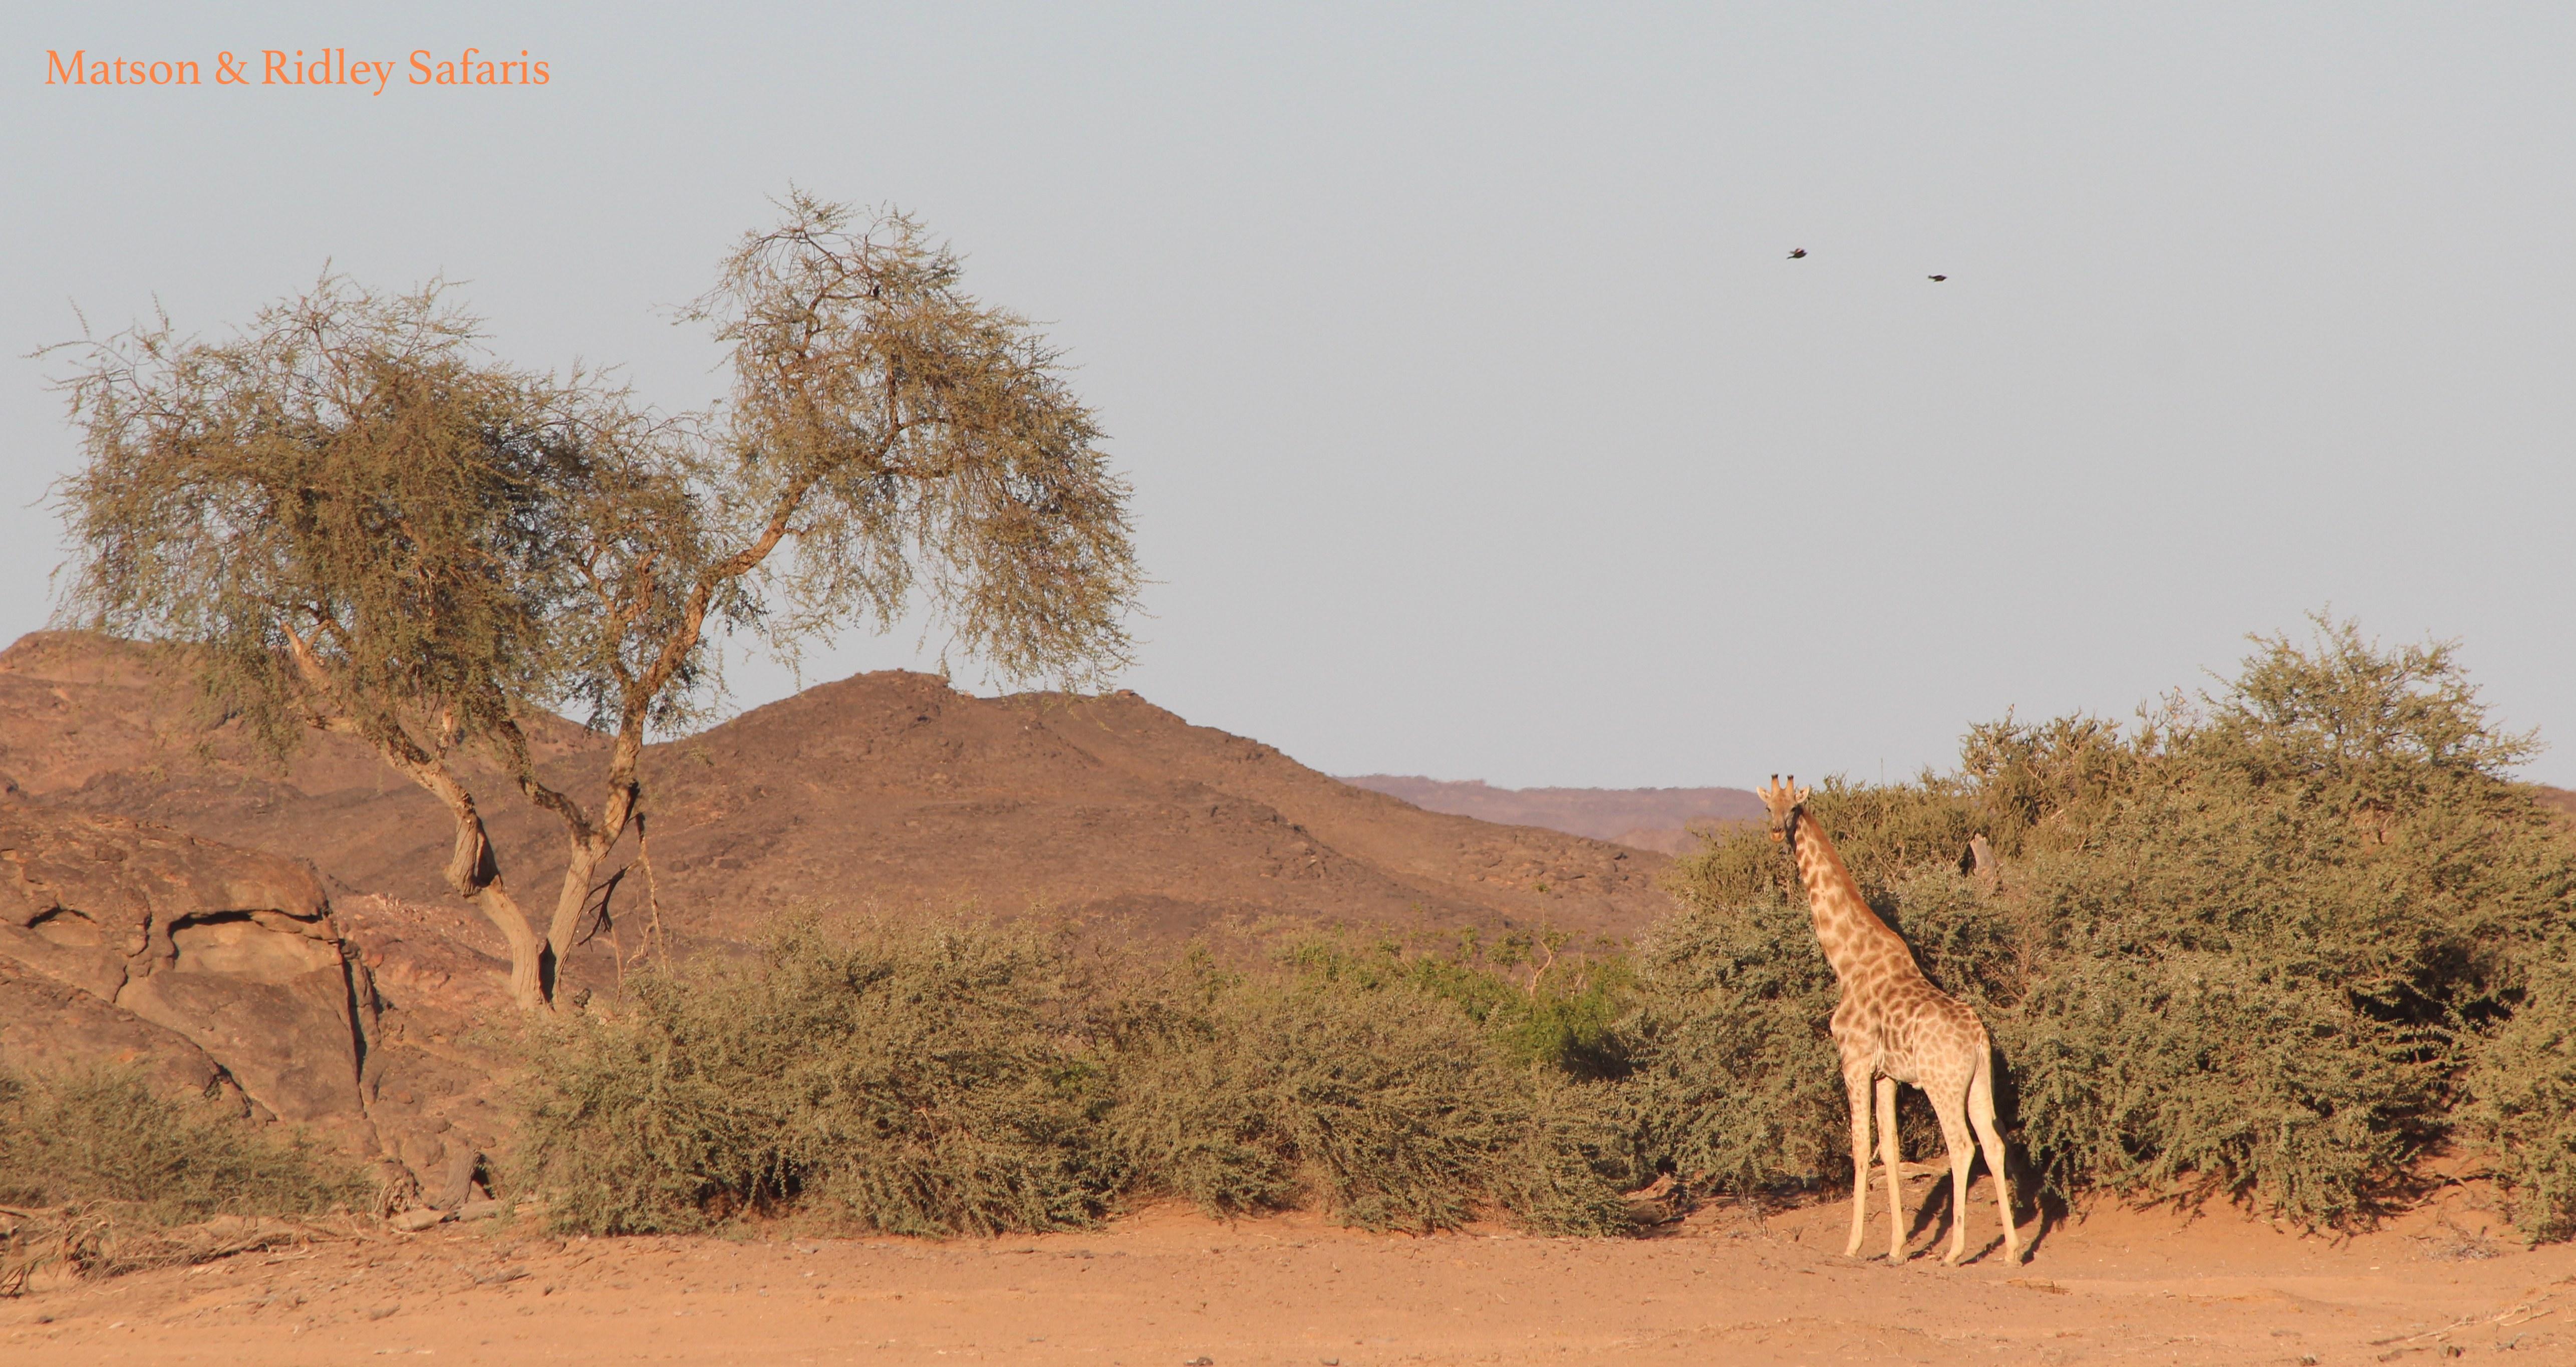 Desert dwelling giraffes